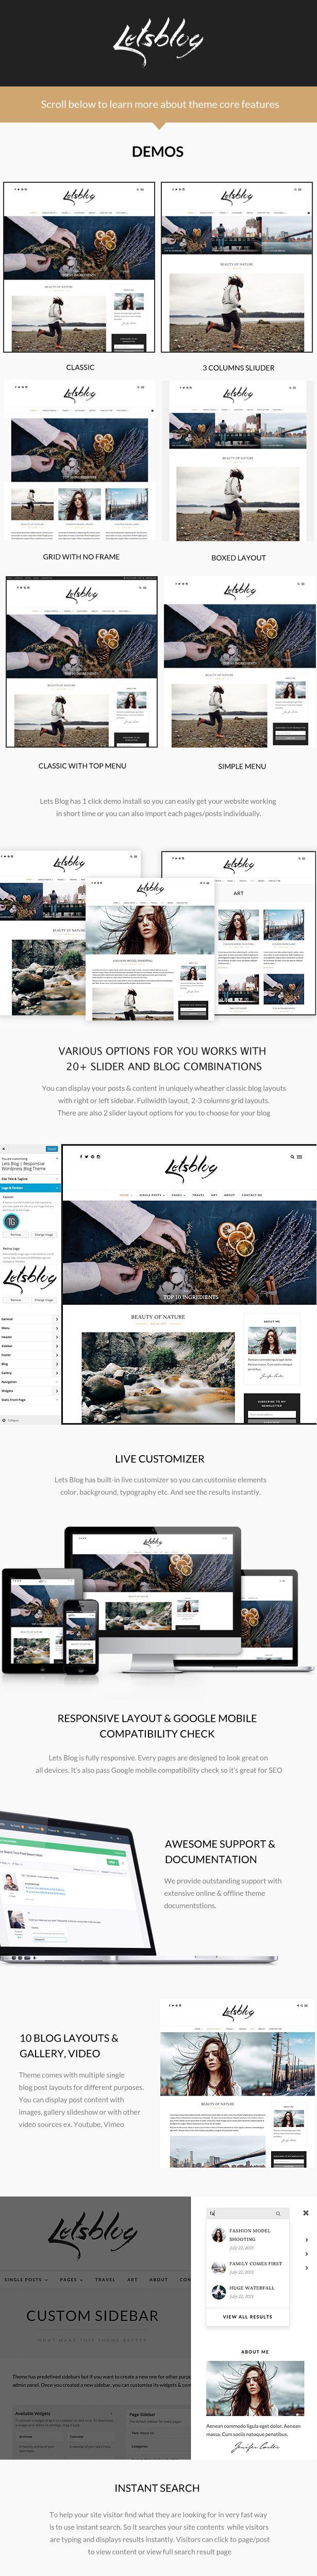 Let's Blog responsive wordpress theme